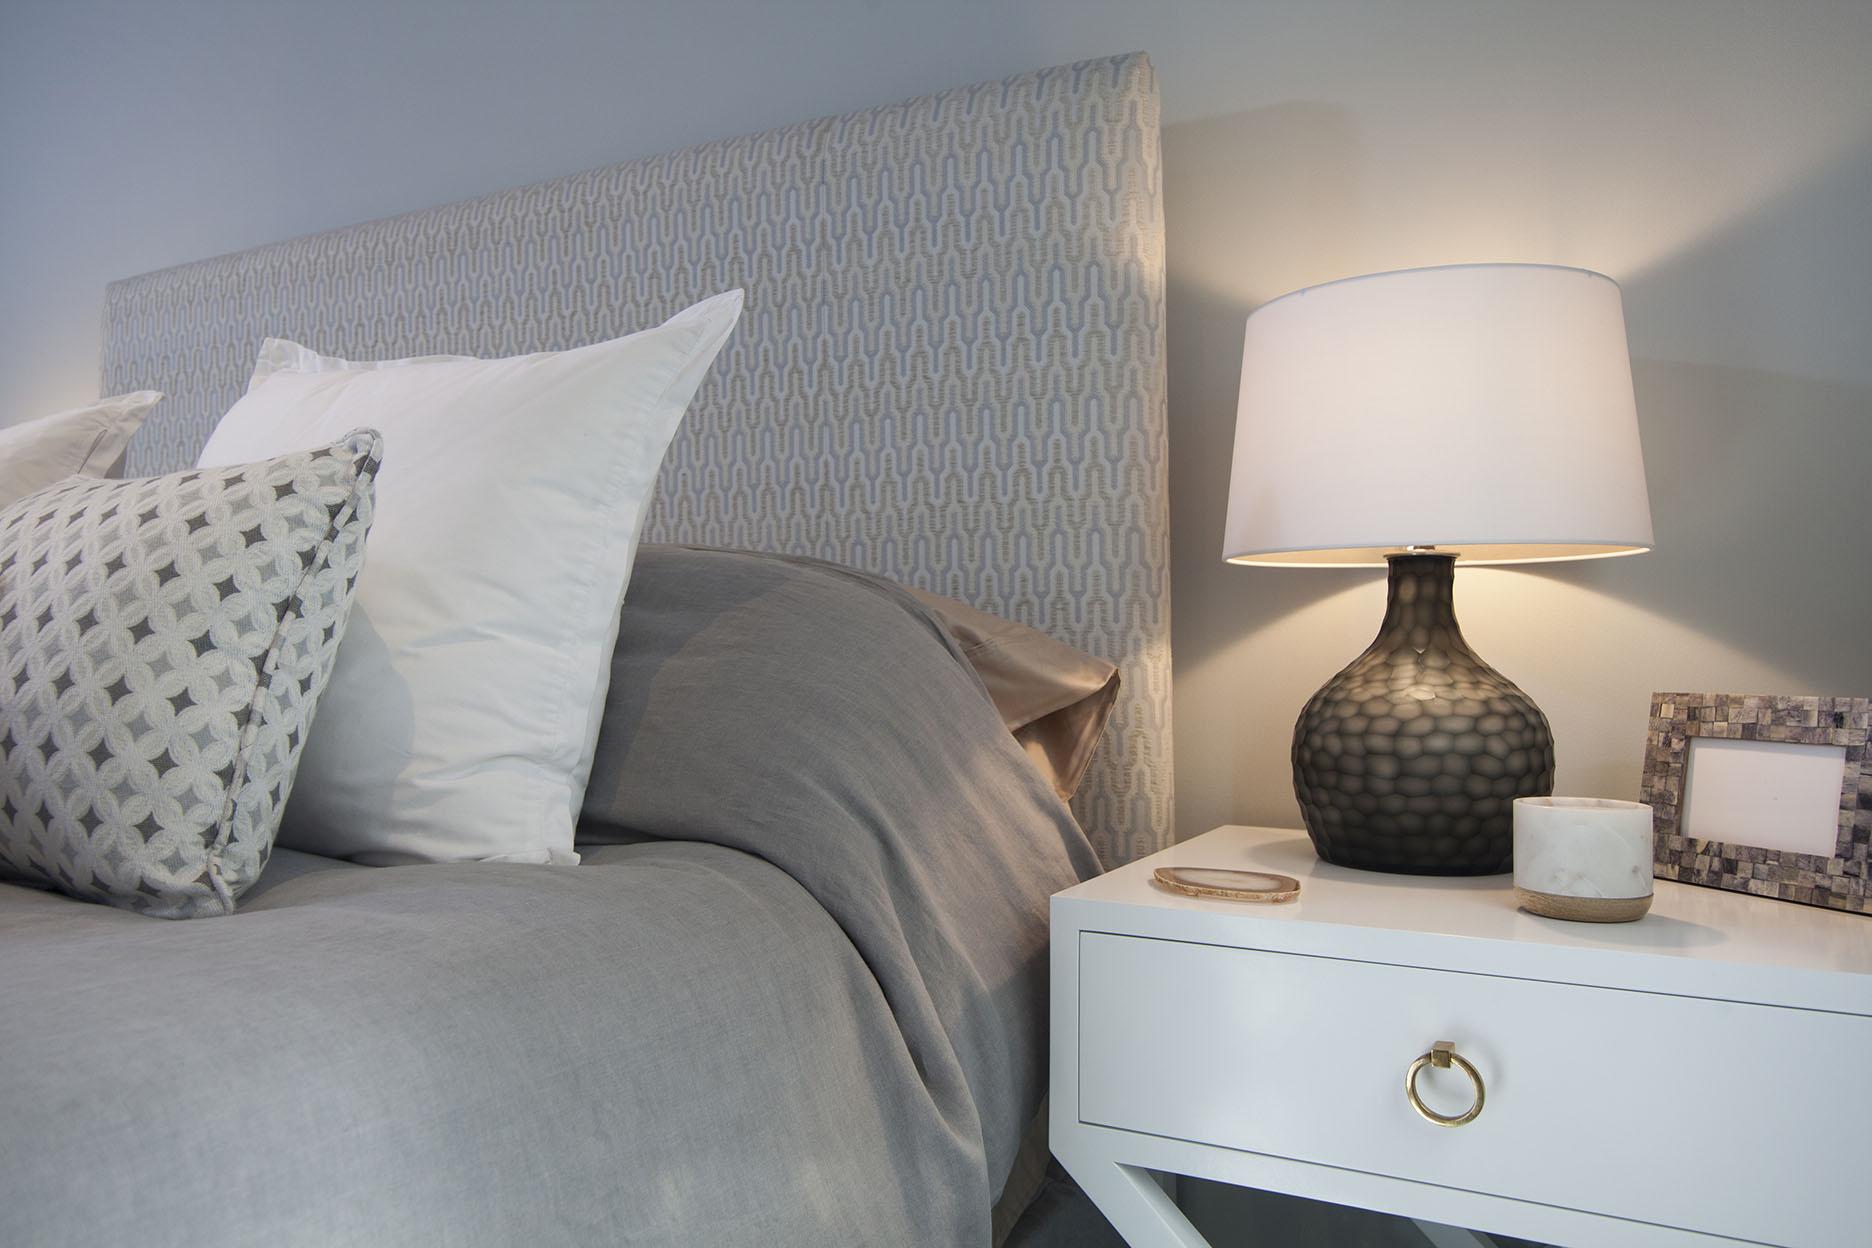 Best interior designers los angeles master bedroom copy - Interior design los angeles ...